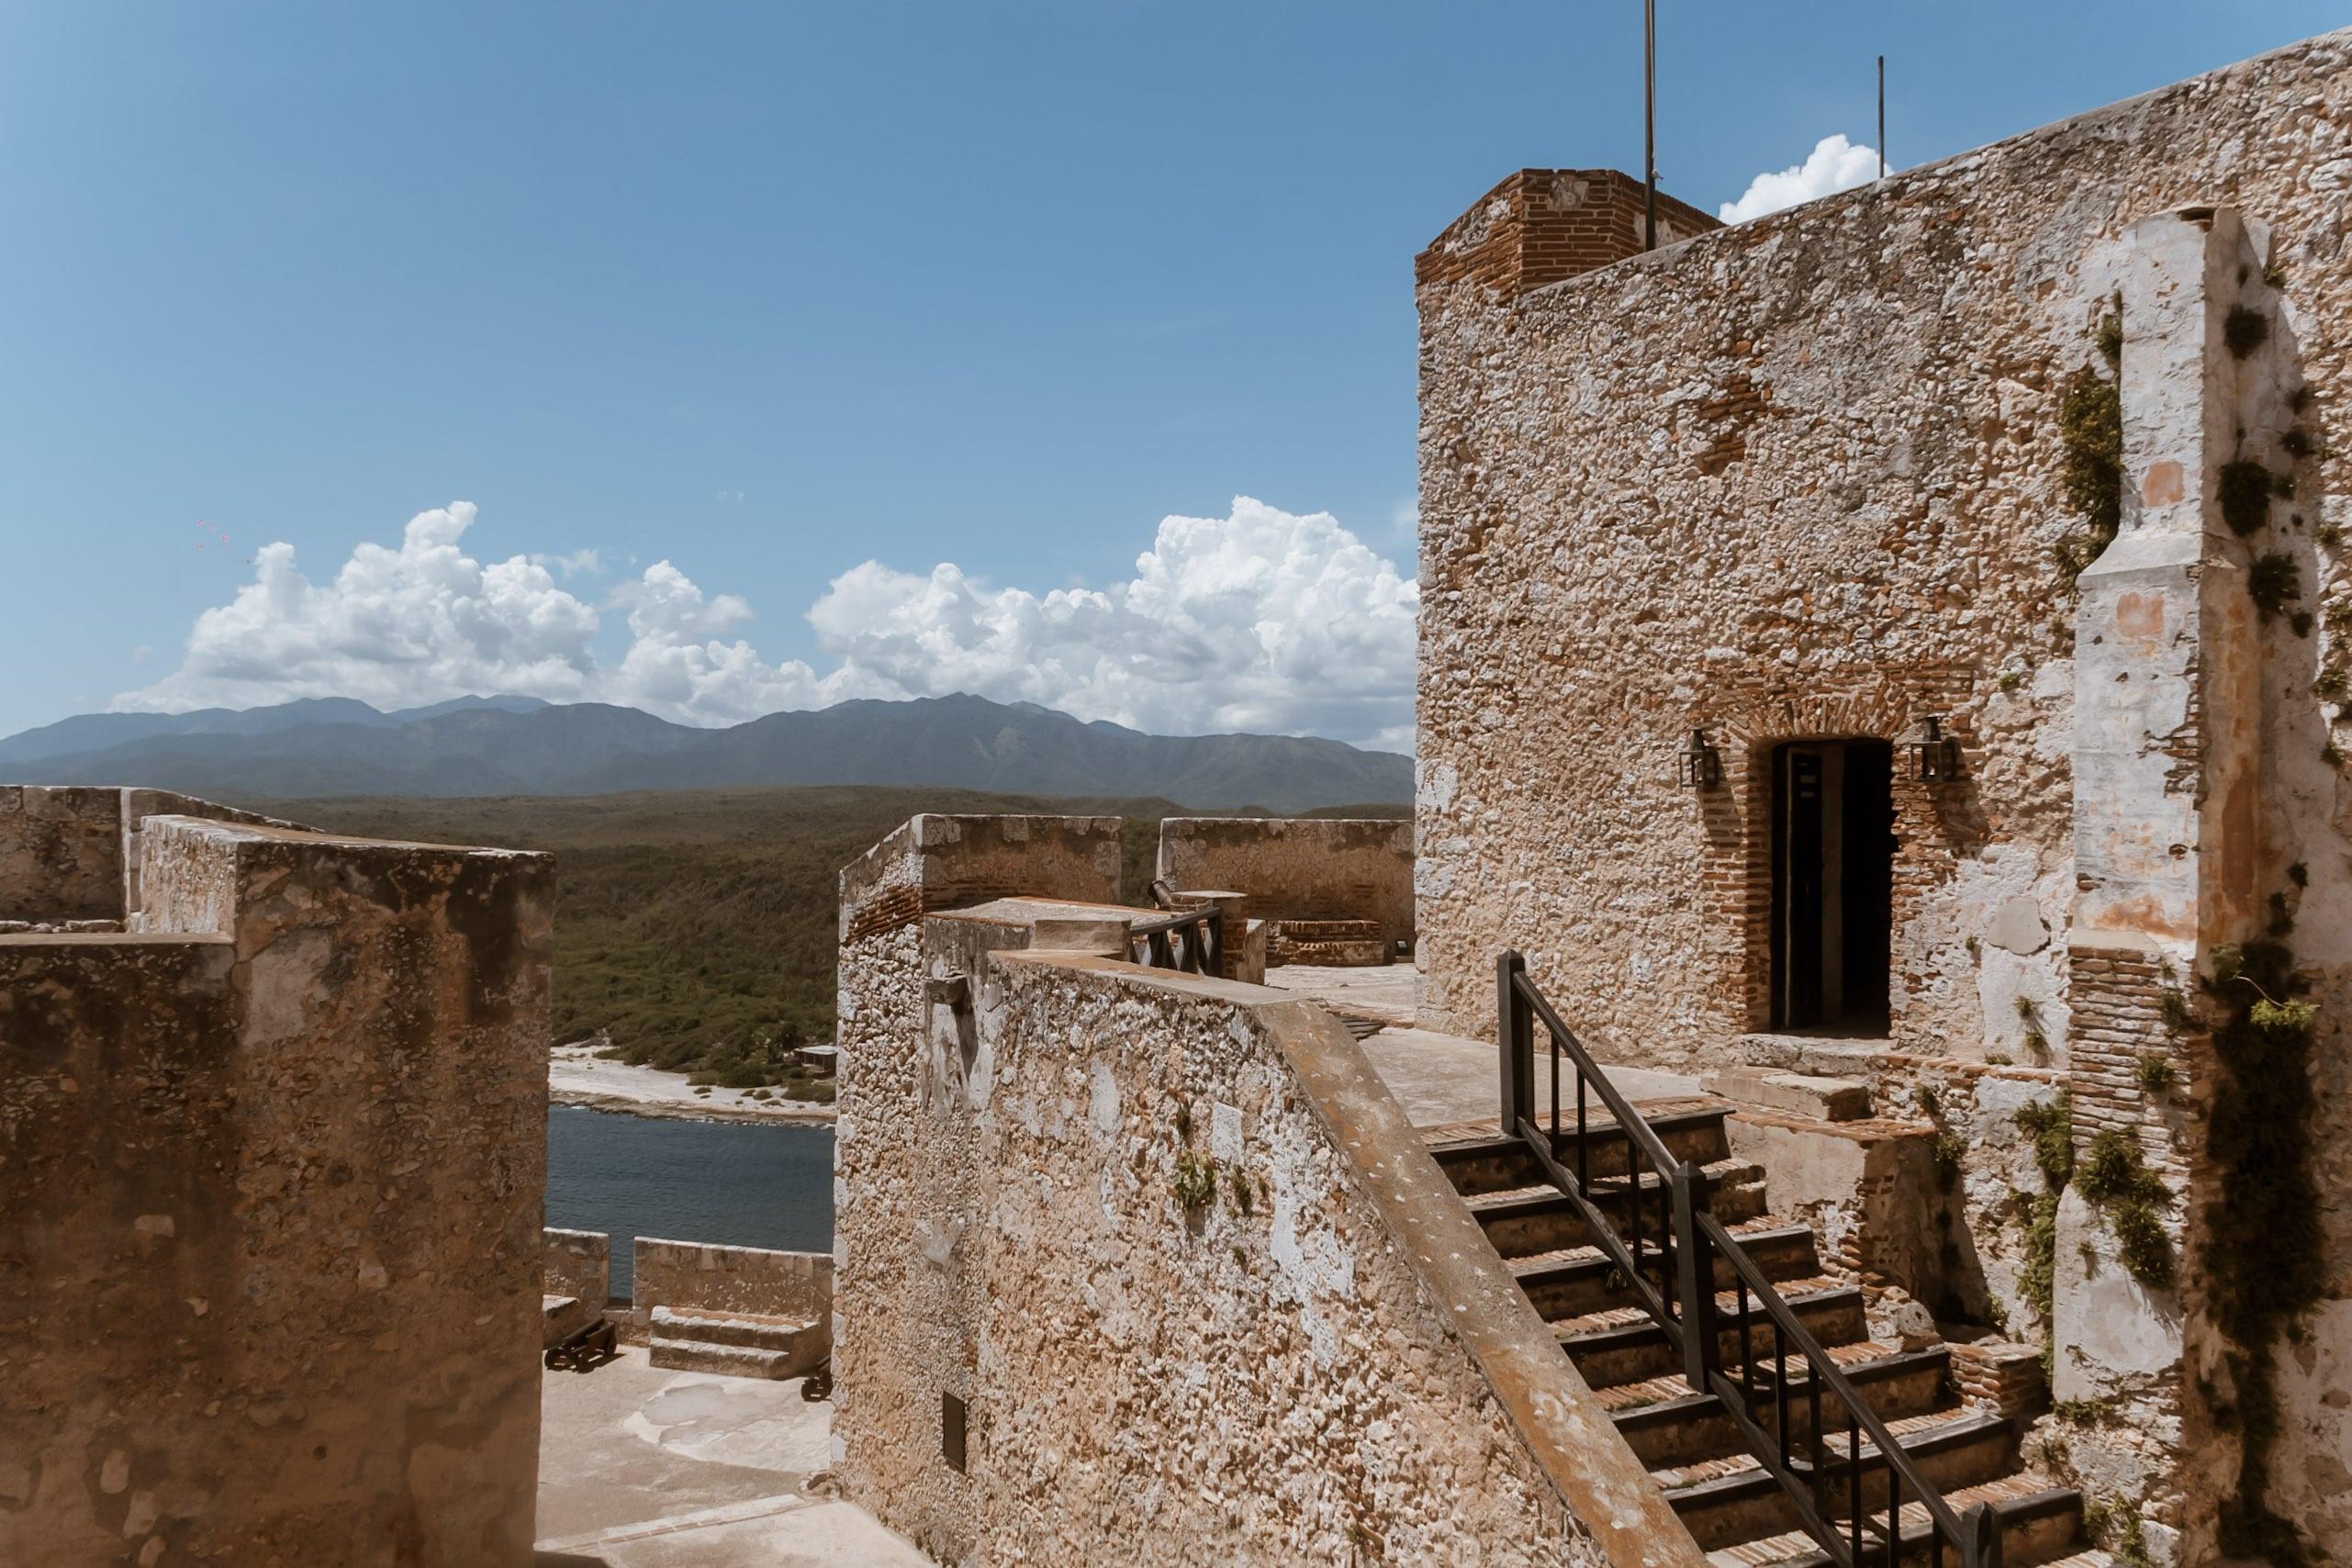 Festung in Kuba